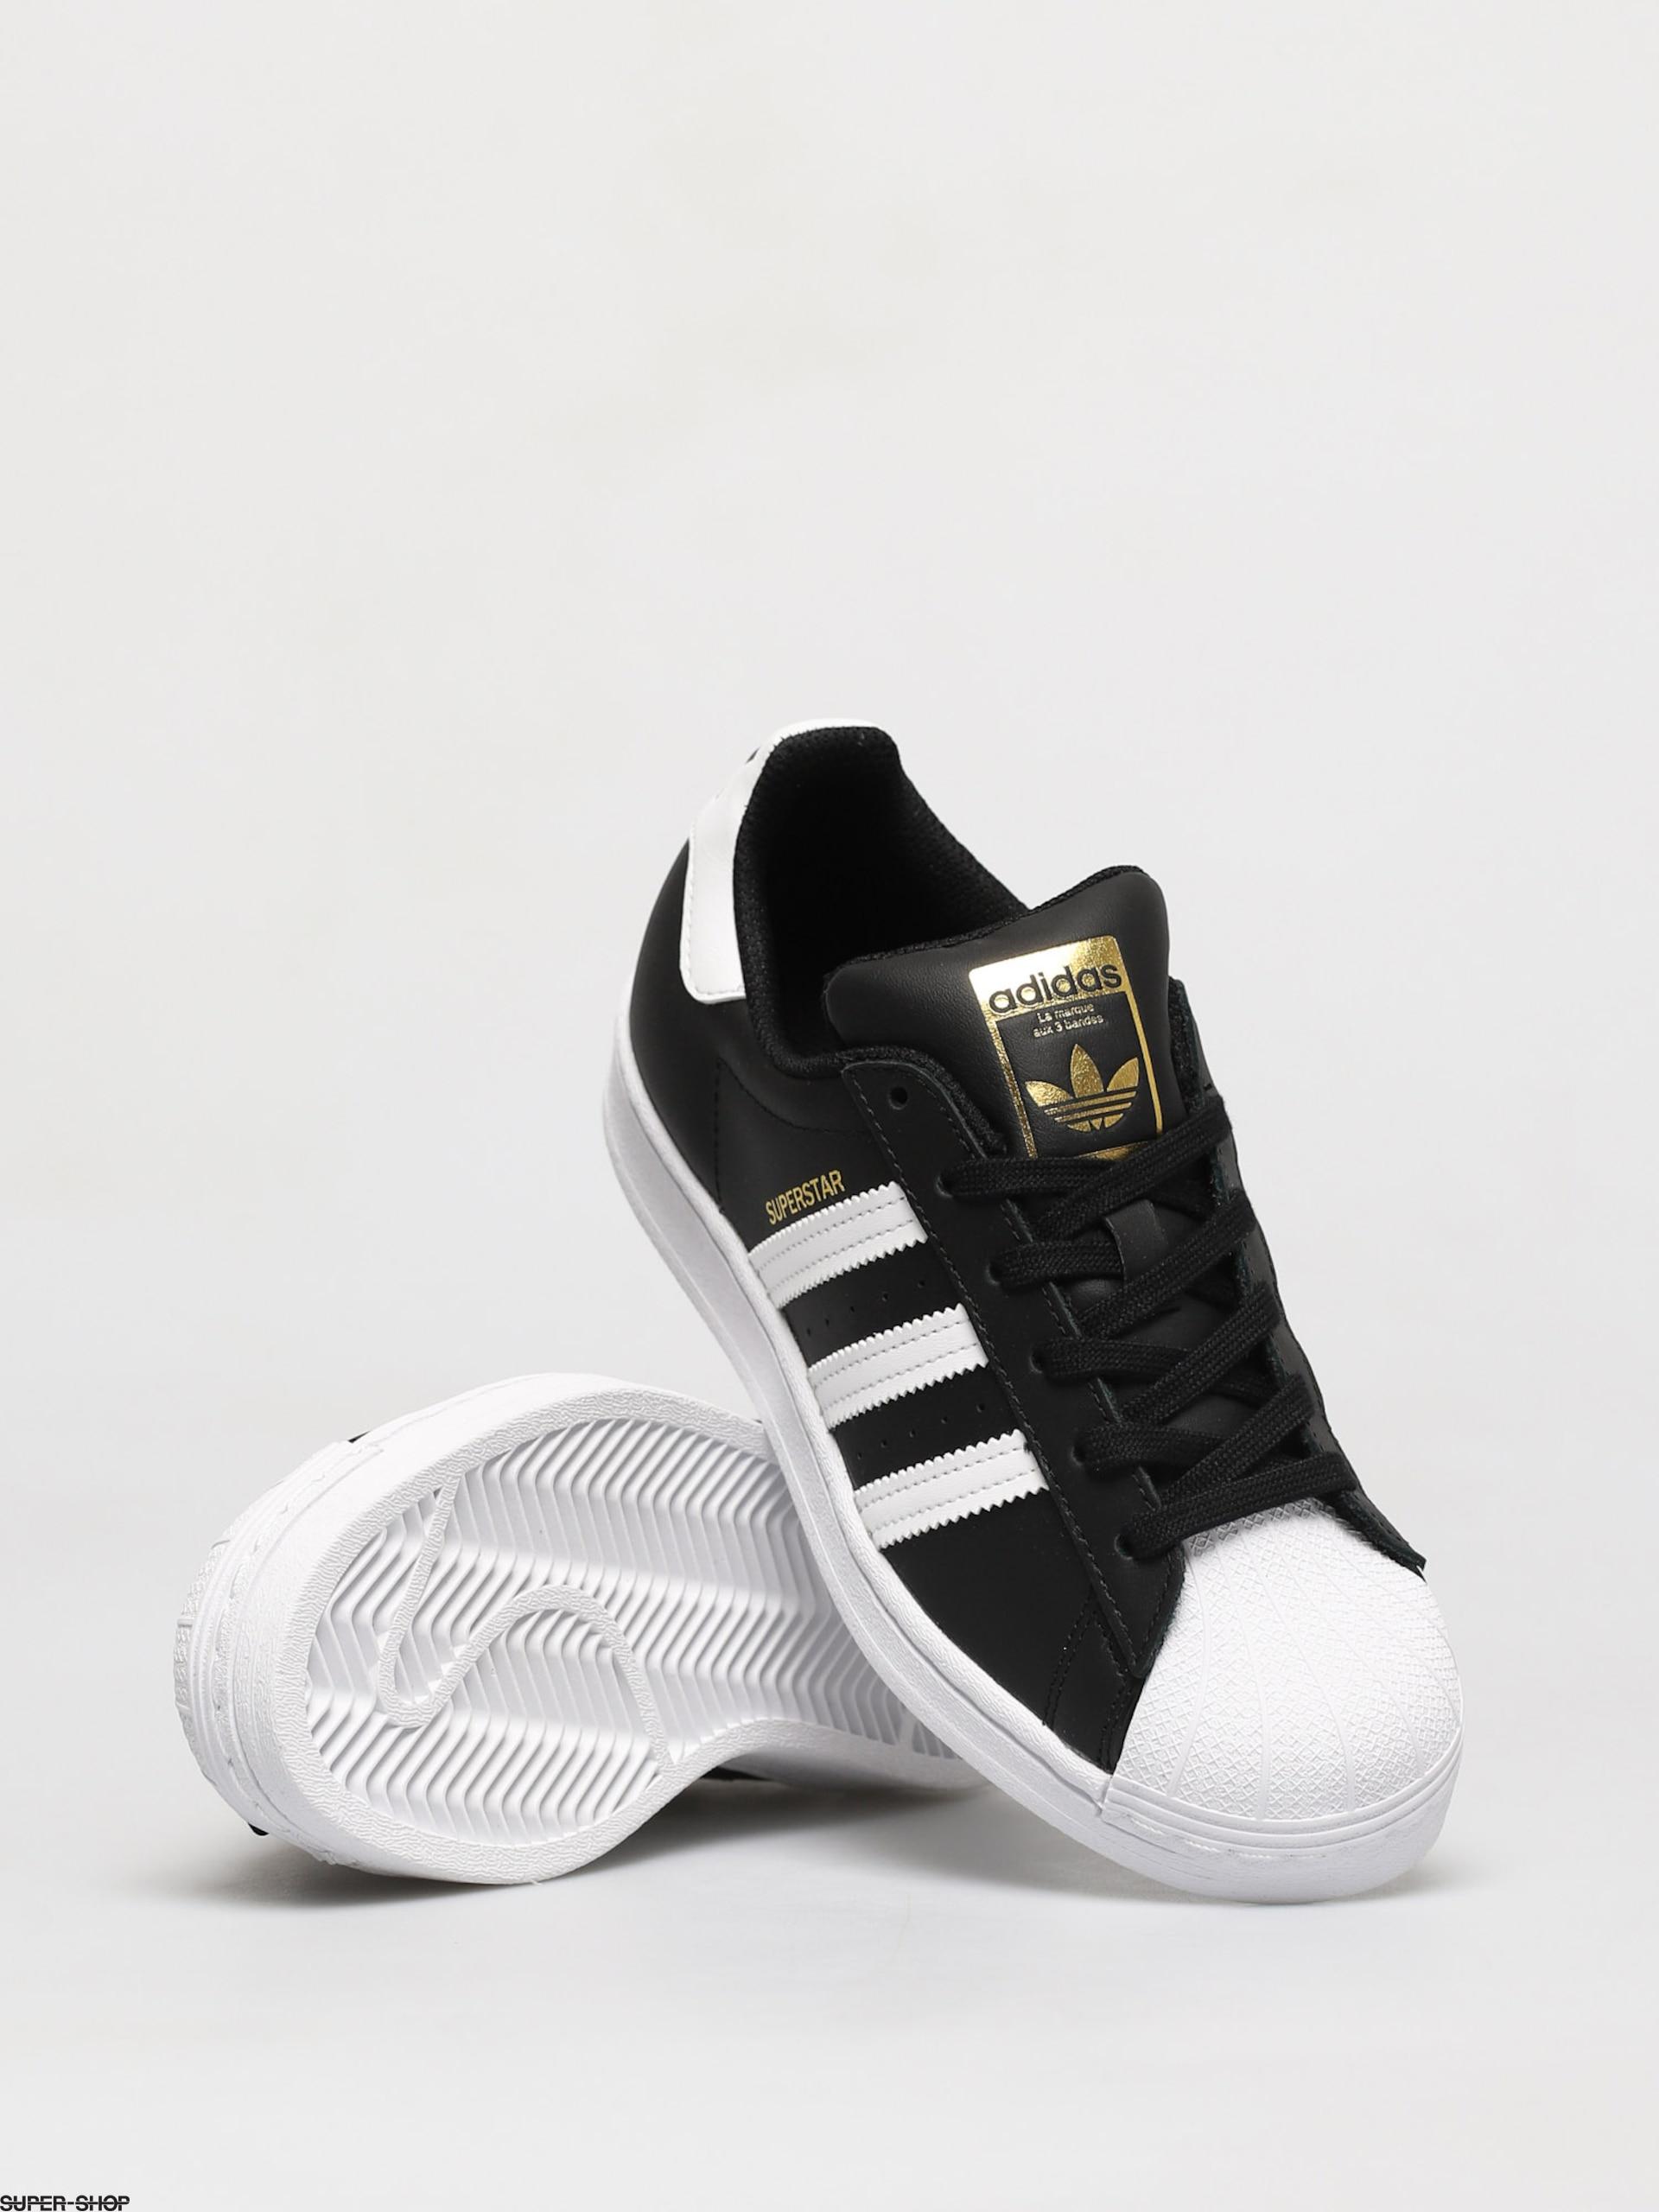 Adidas Original Superstar Made with by